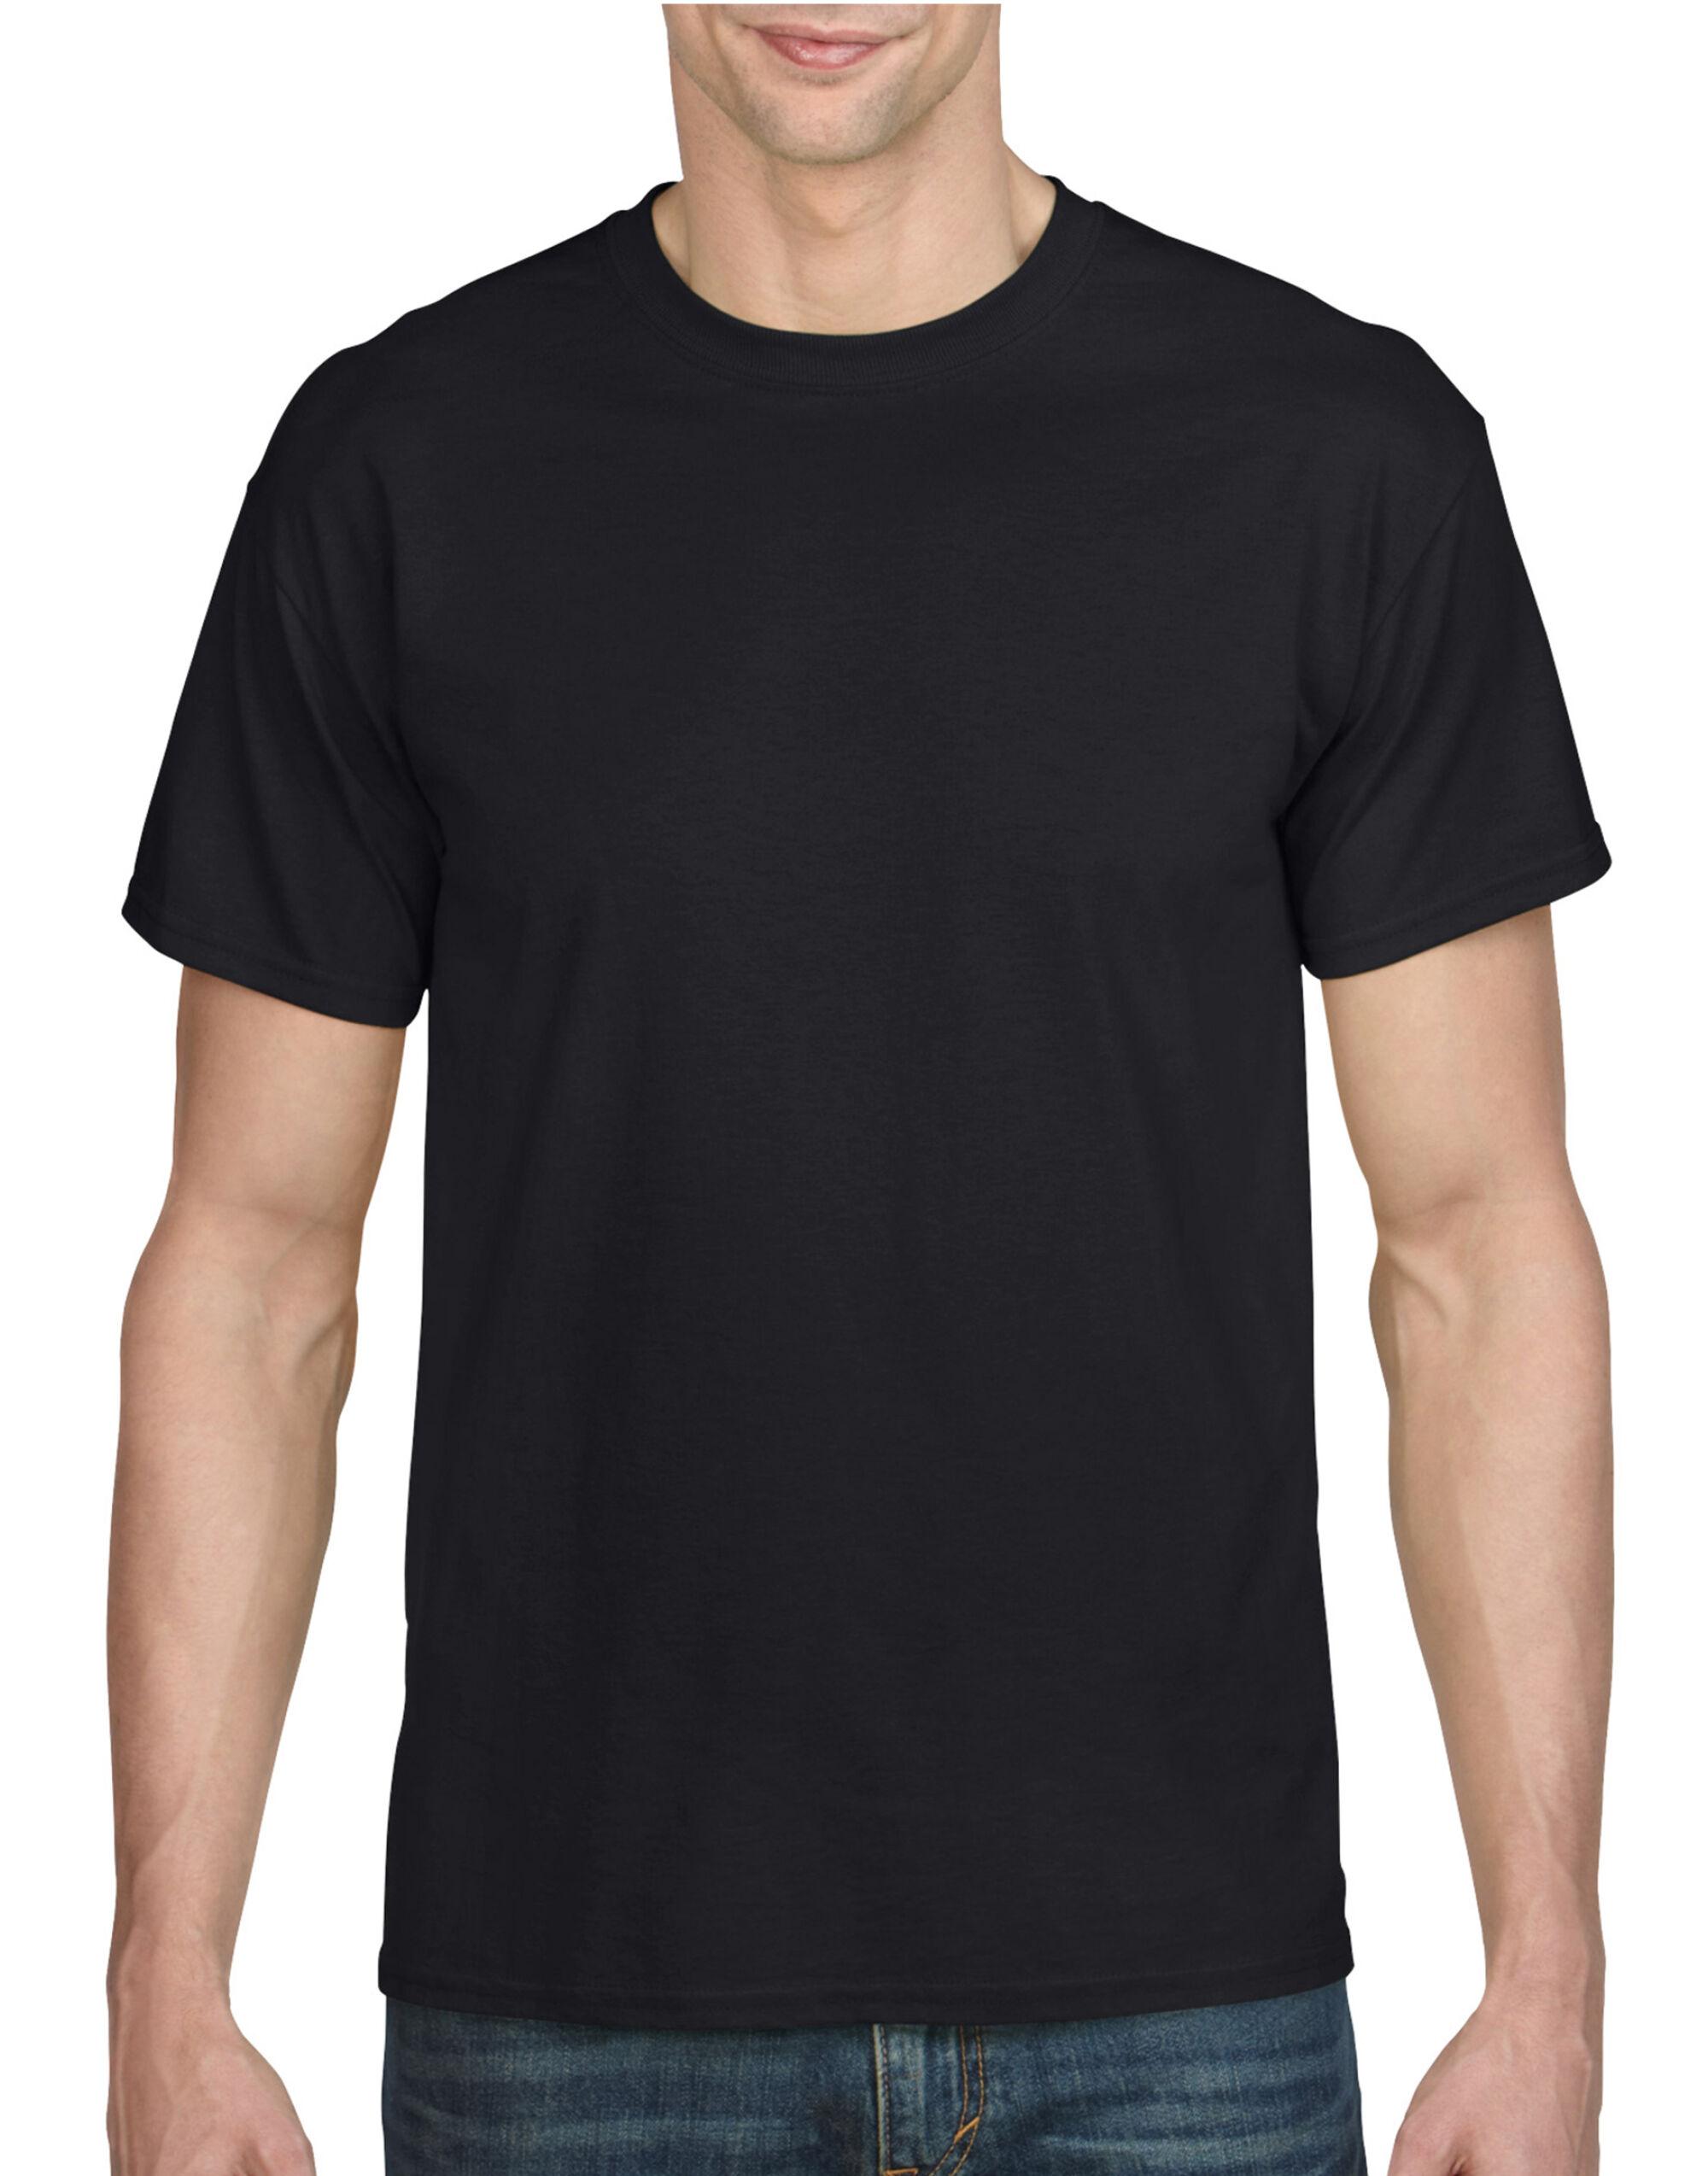 Gildan Dryblend Adult T-shirt